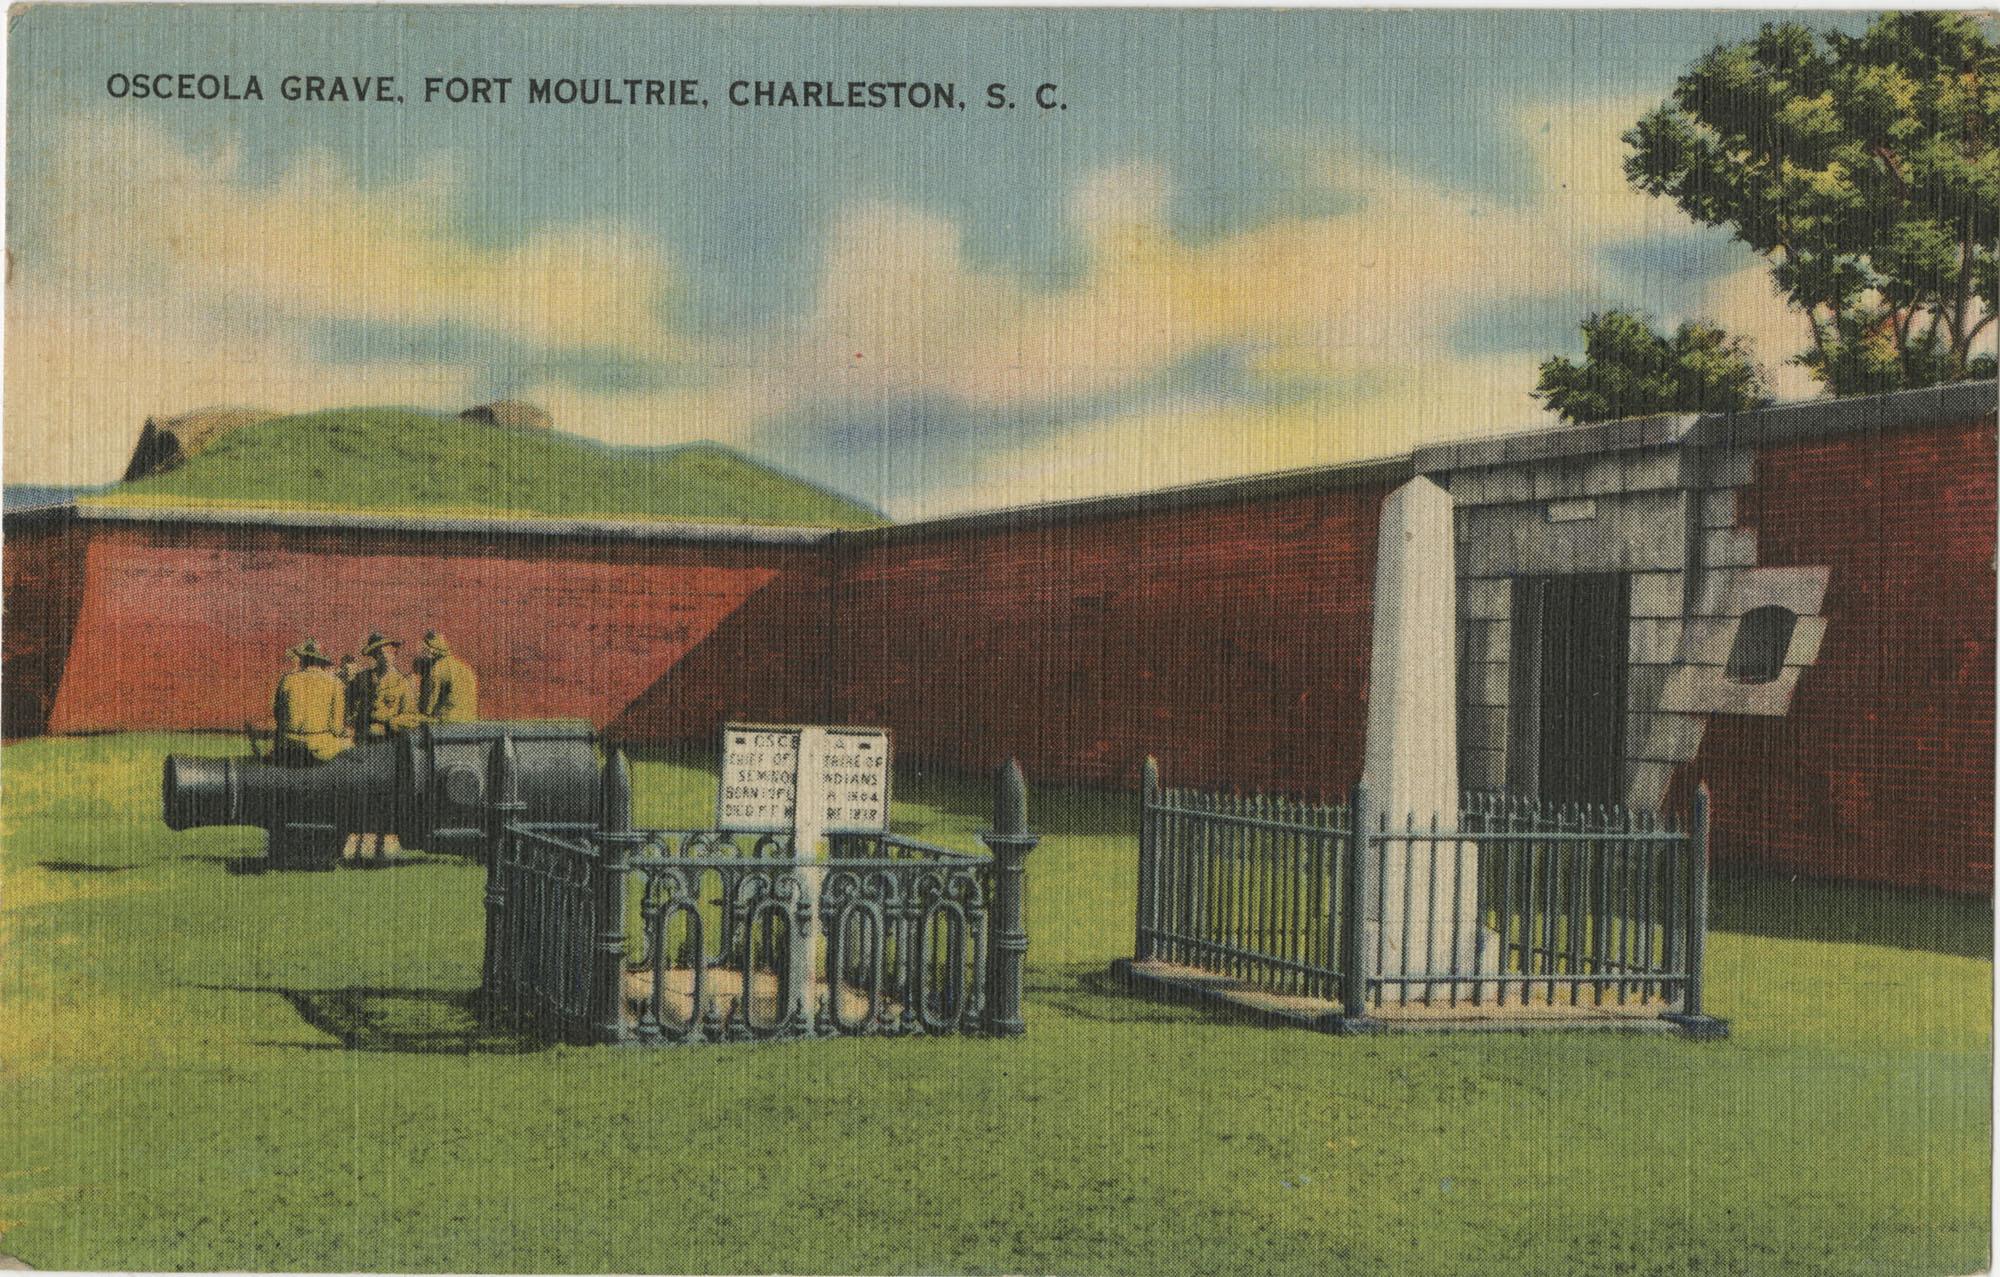 Osceola Grave, Fort Moultrie, Charleston, S.C.